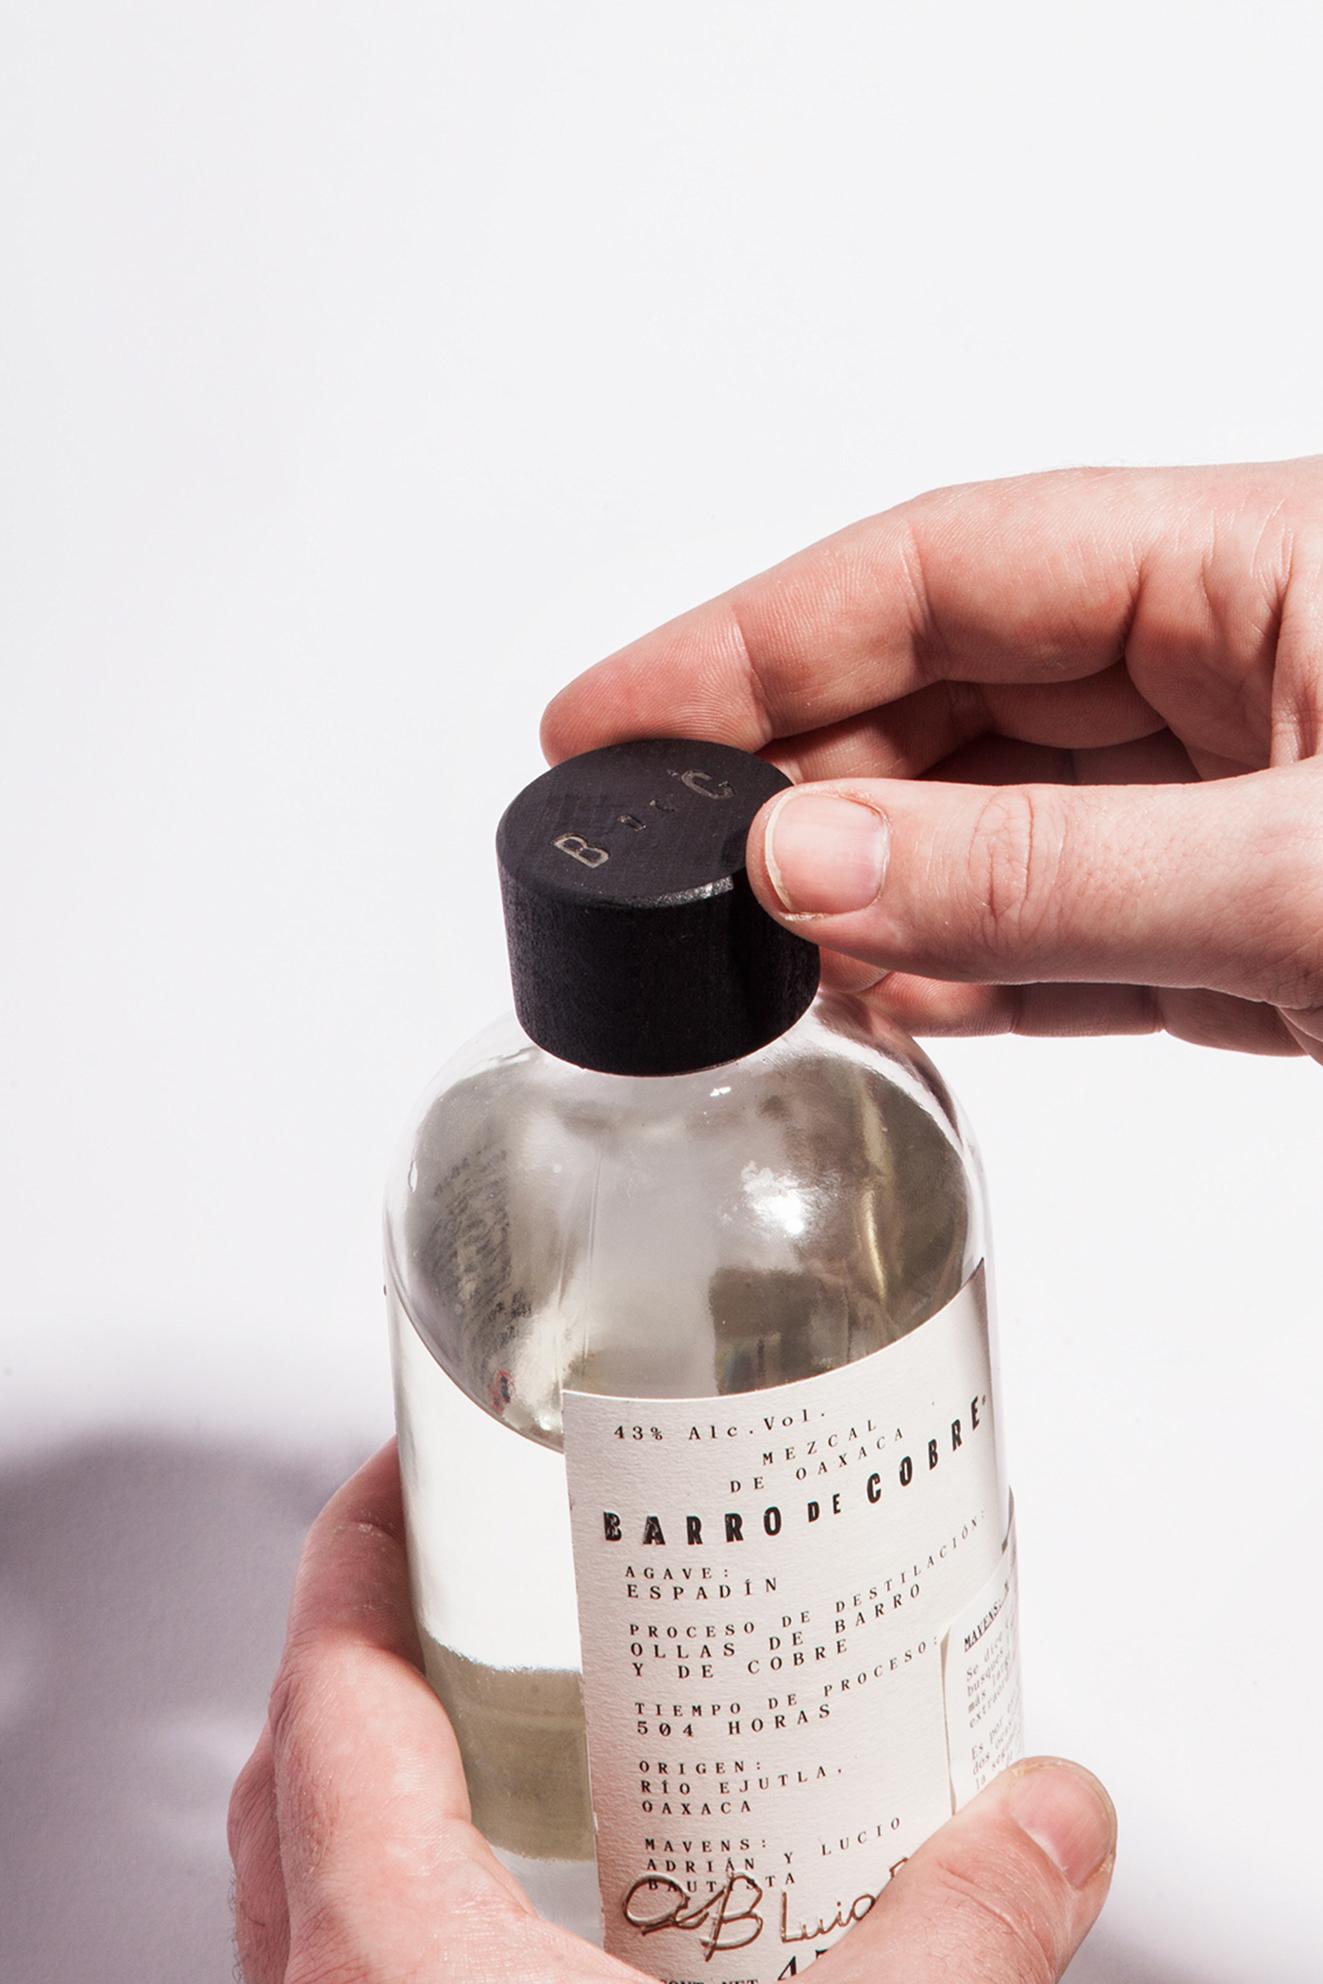 botellamezcalbarrodecobre1.jpg